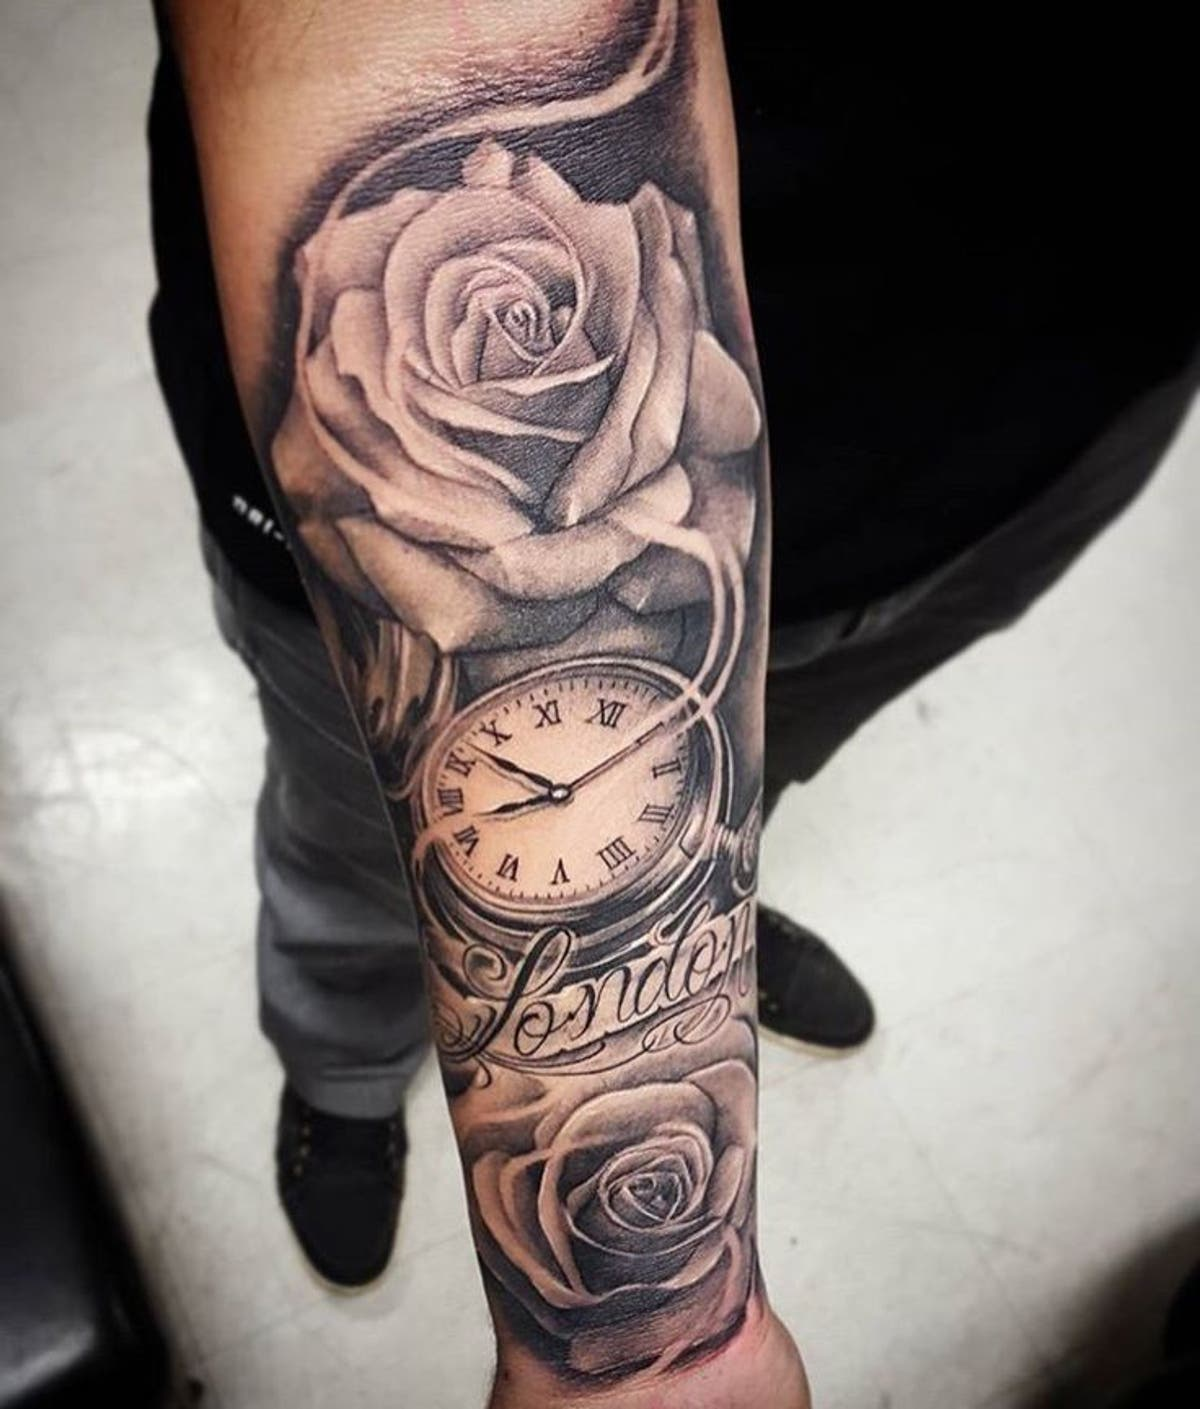 Top 100 Best Arm Tattoos Ever For Men Unique Cool Design